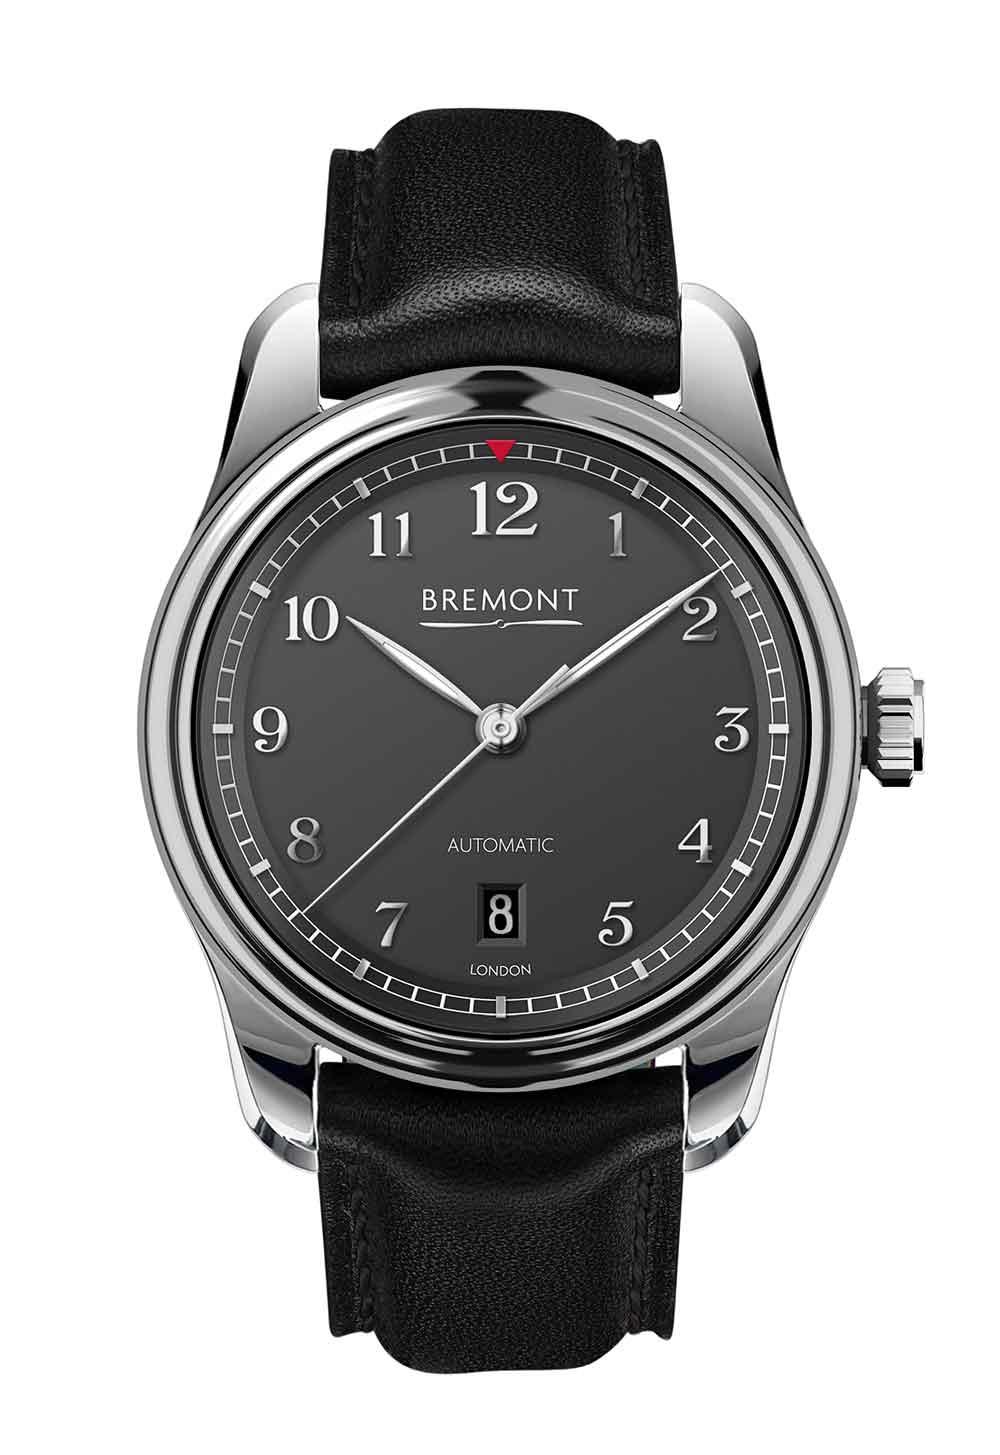 Bremont Airco Mach 2 pilot's watch